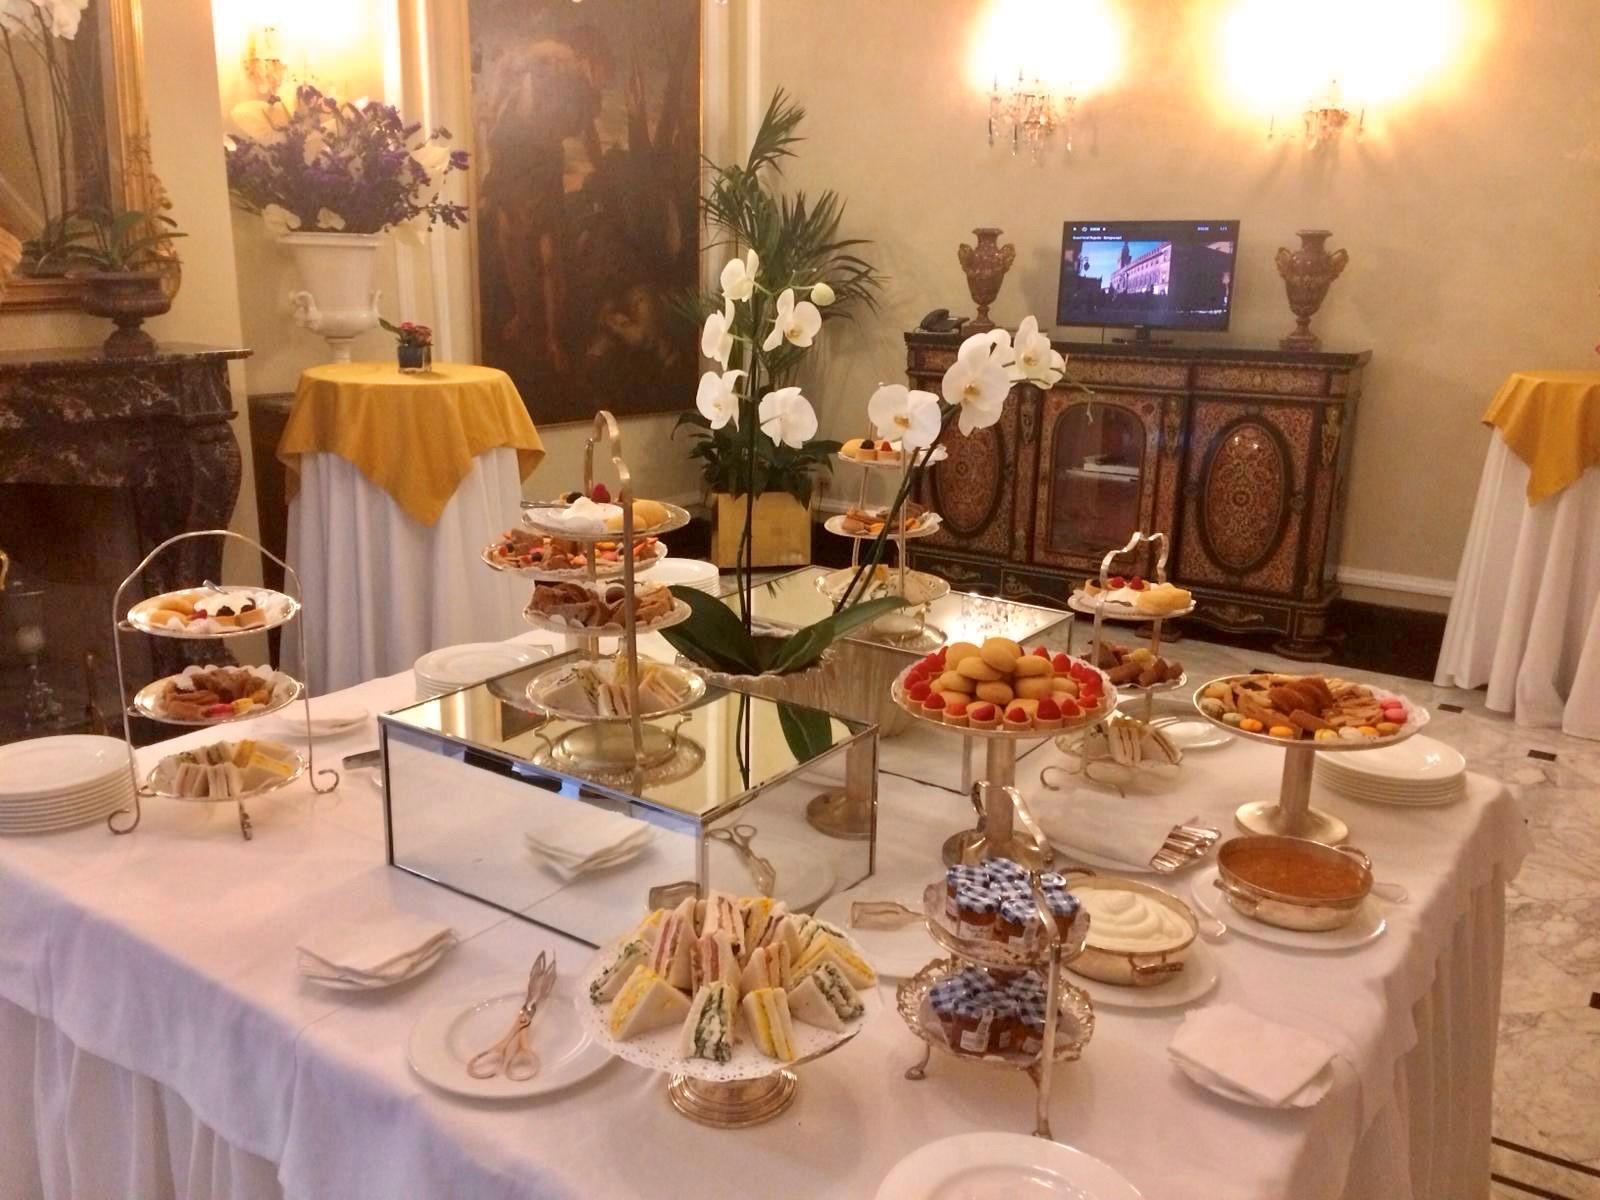 Tè e pranzo d'affari aziendale proposti dal Majestic e da Etiquette Academy